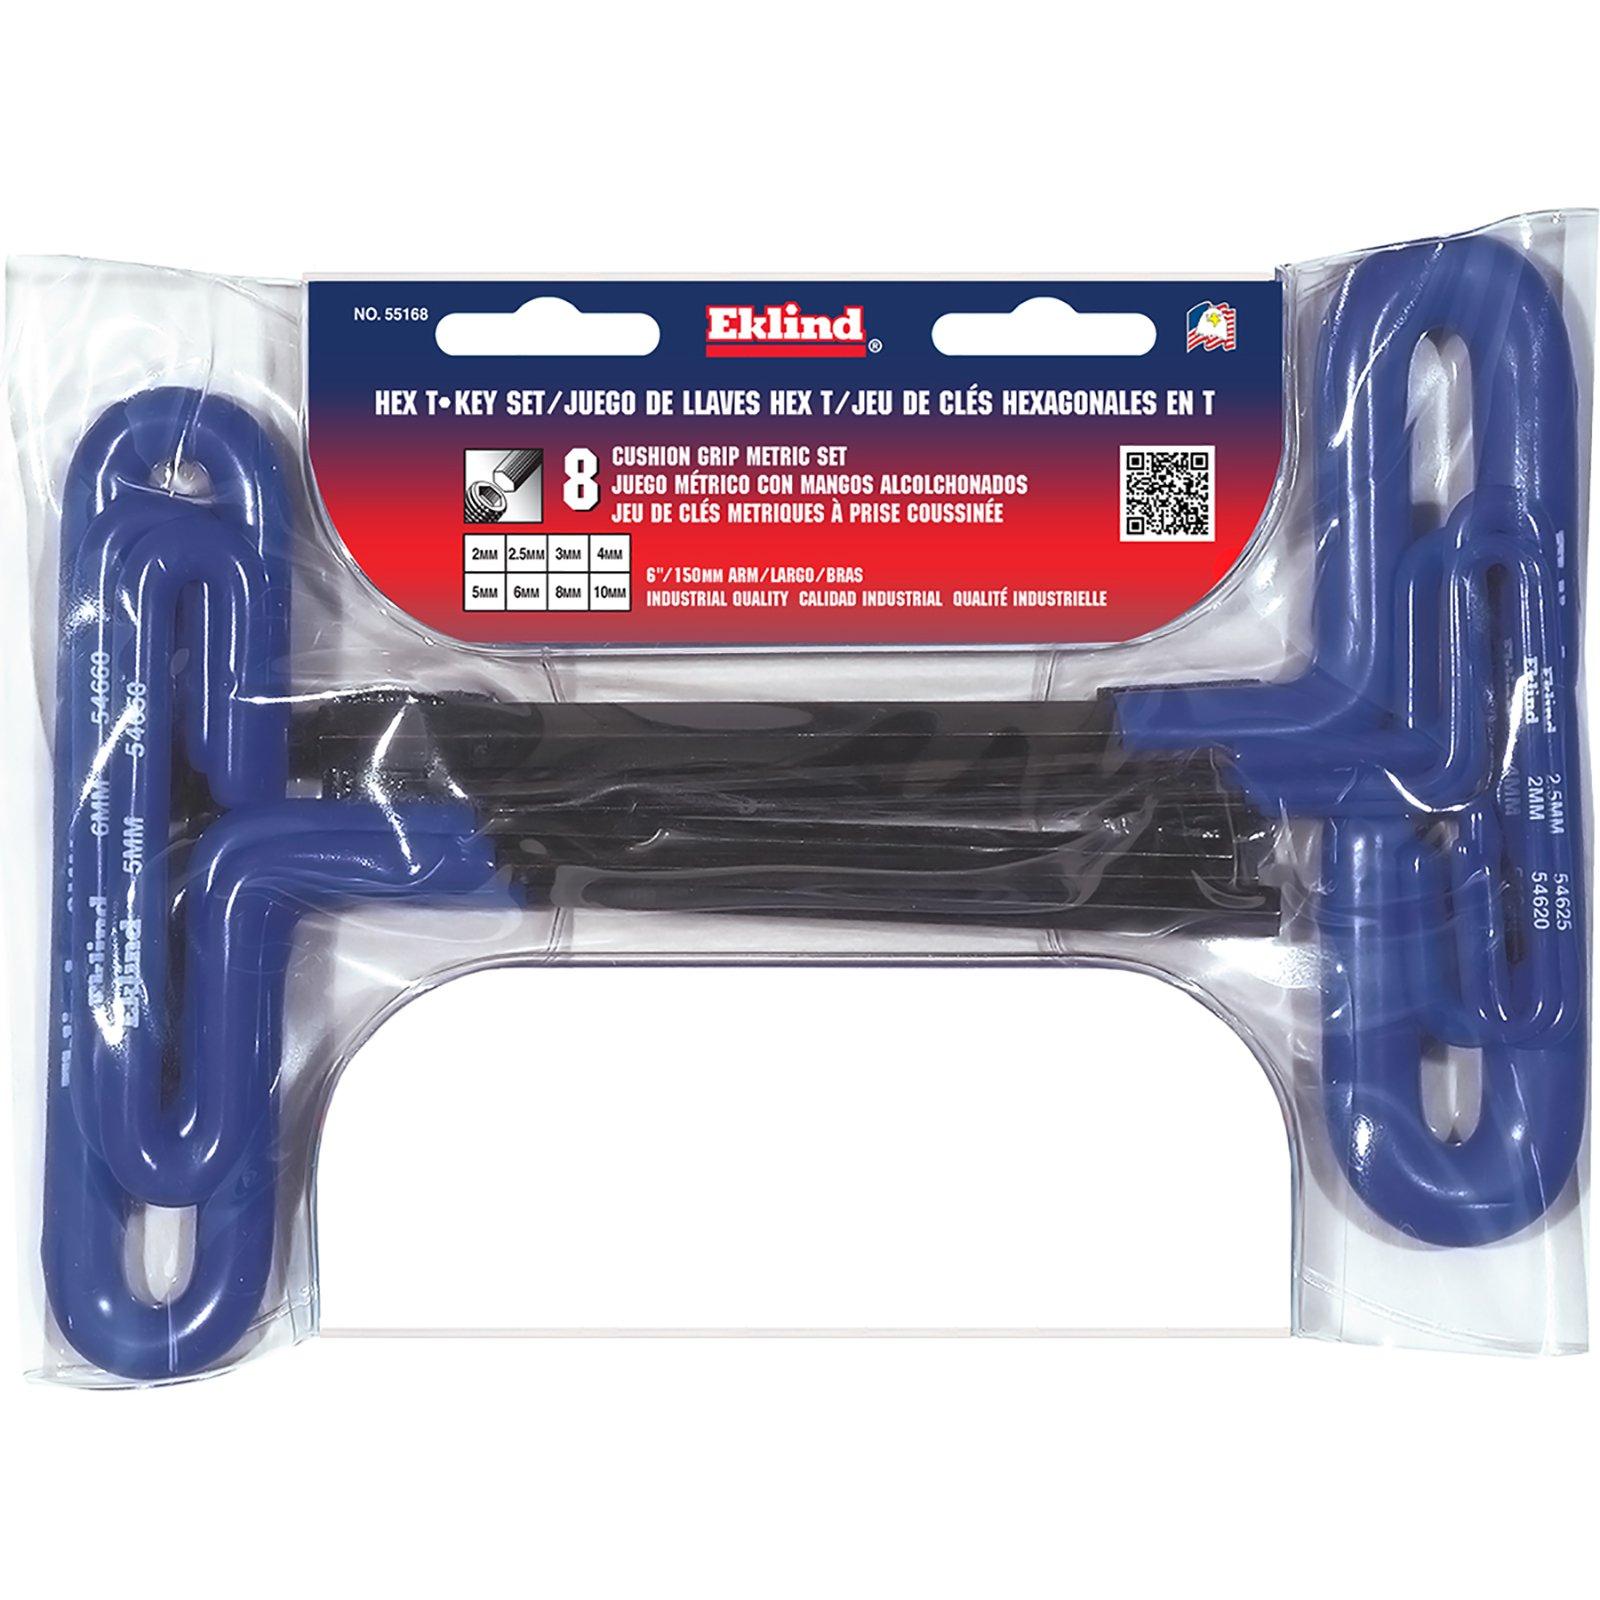 EKLIND 55168 Cushion Grip Hex T-Key allen wrench - 8pc set Metric MM sizes 2-10 (6In shaft) by Eklind Tool